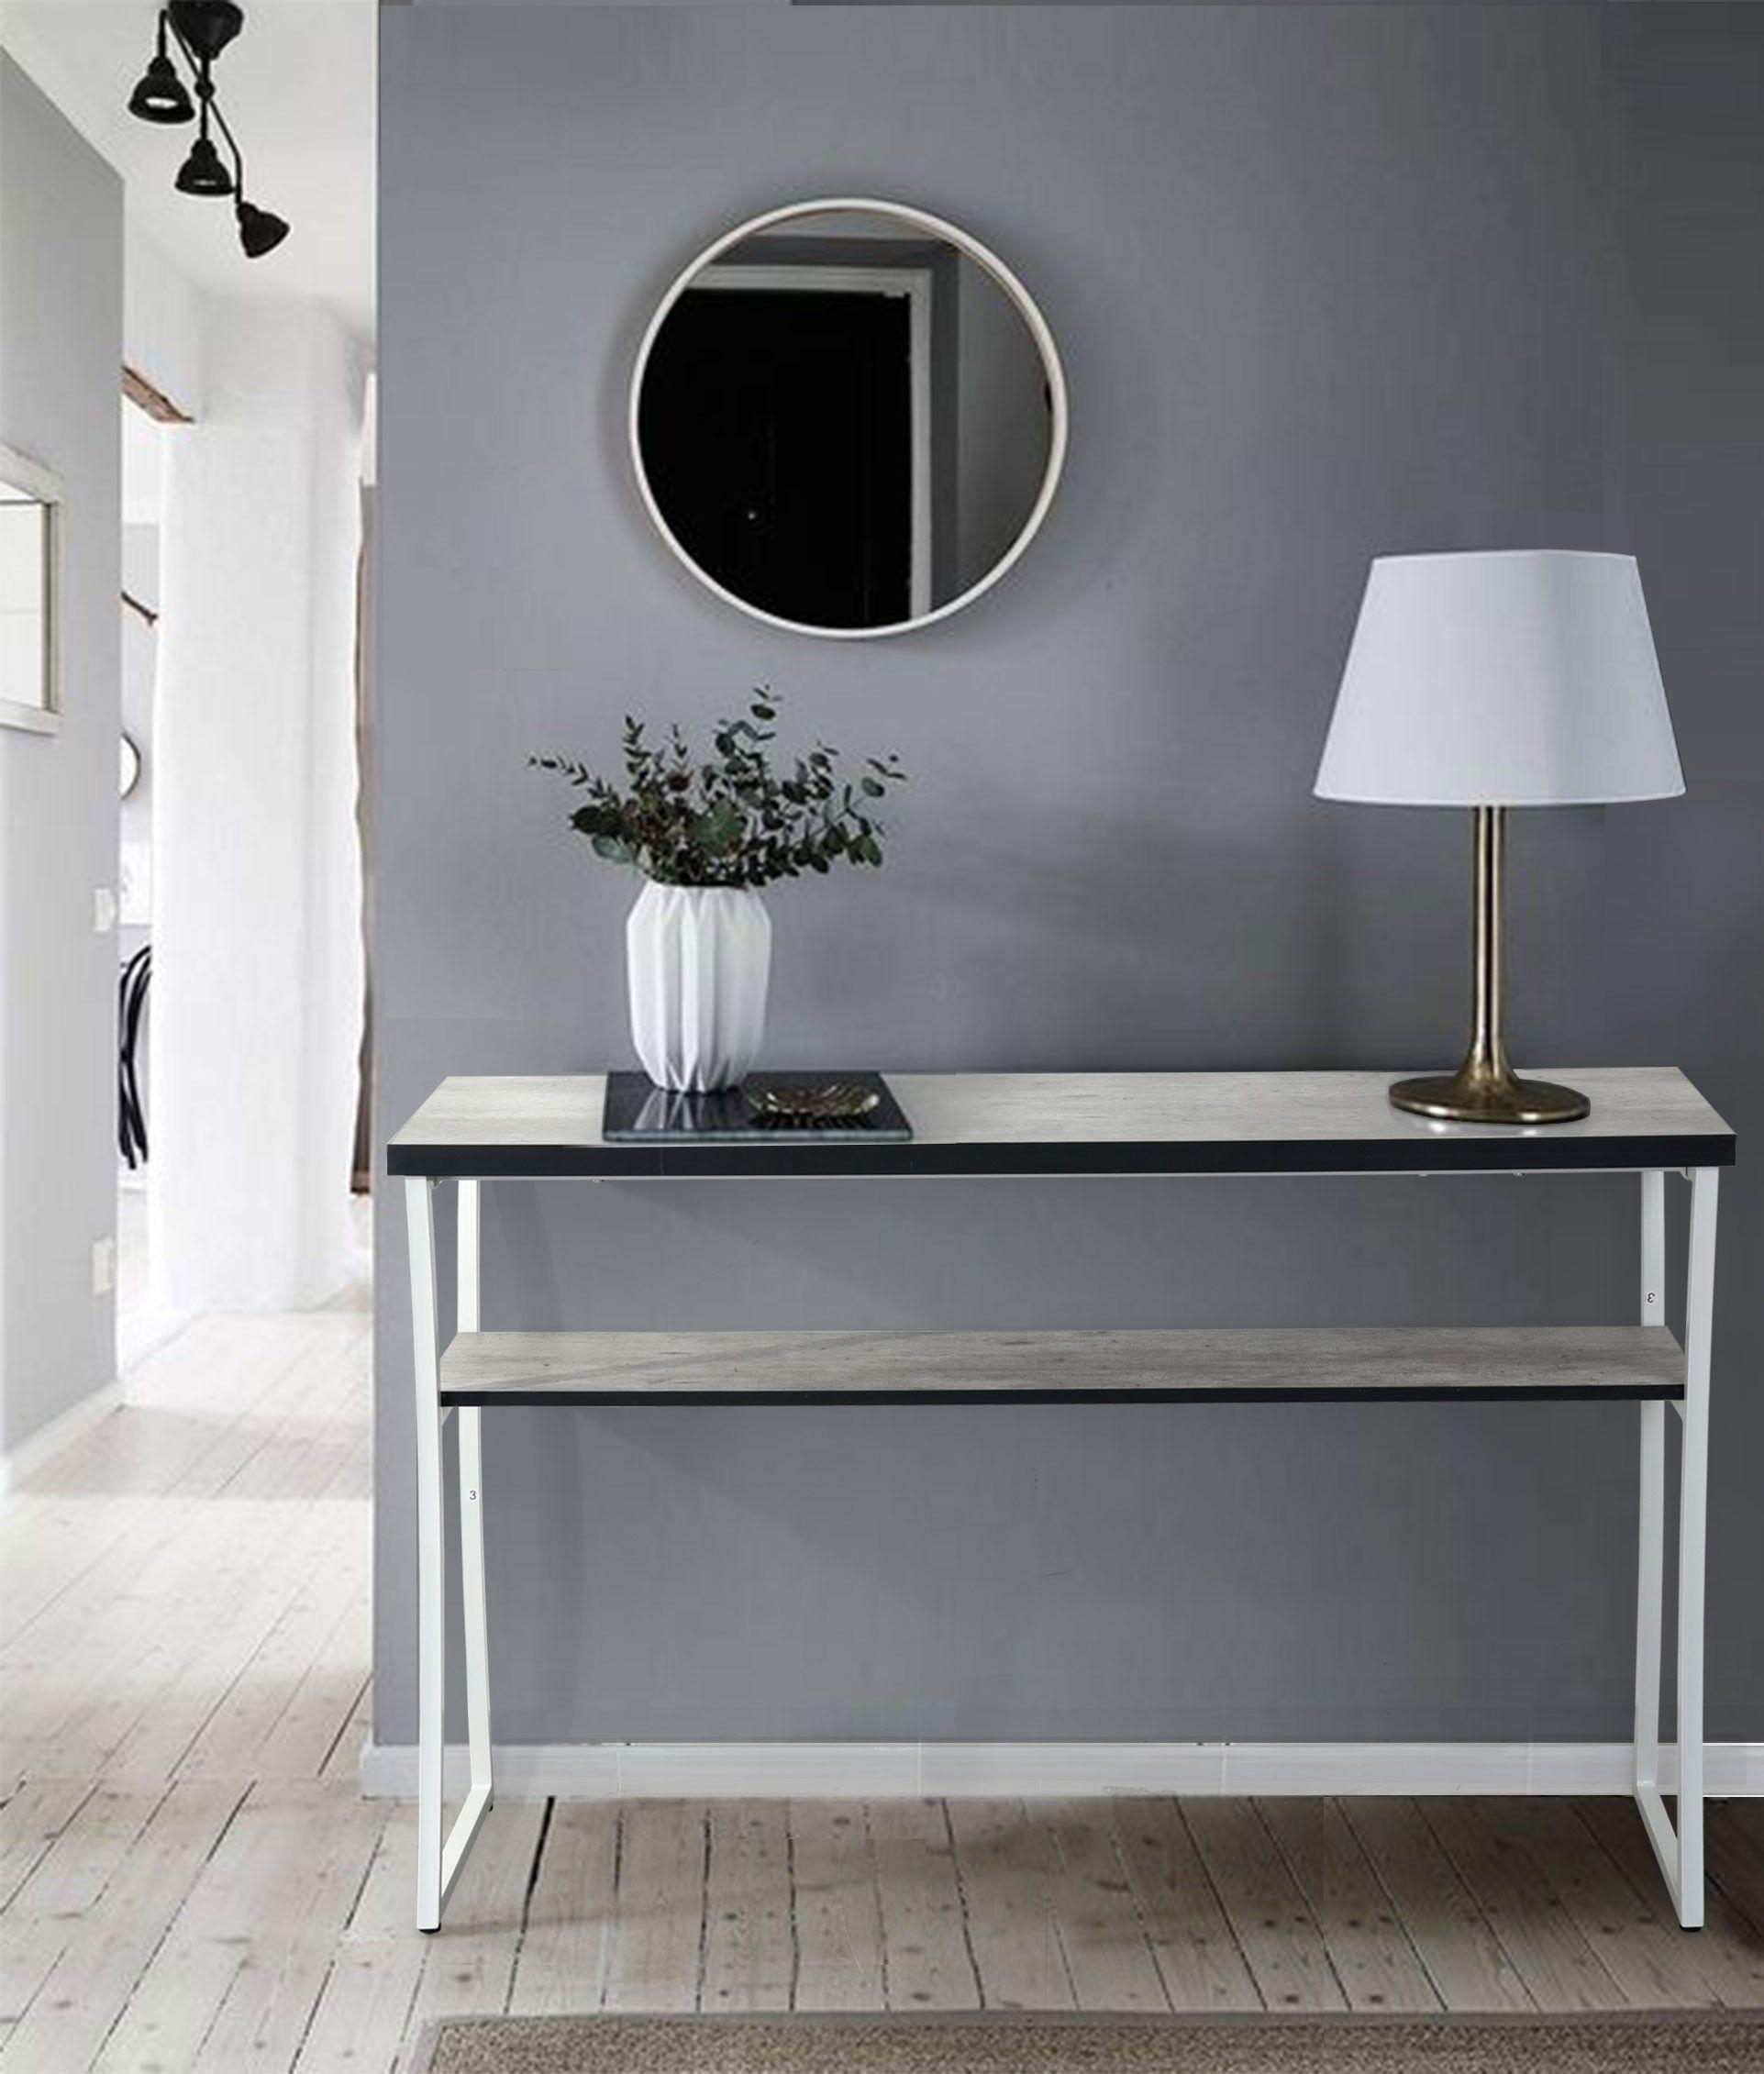 Meuble Appoint Salon Design Table D Appoint Ikea Beau Meuble